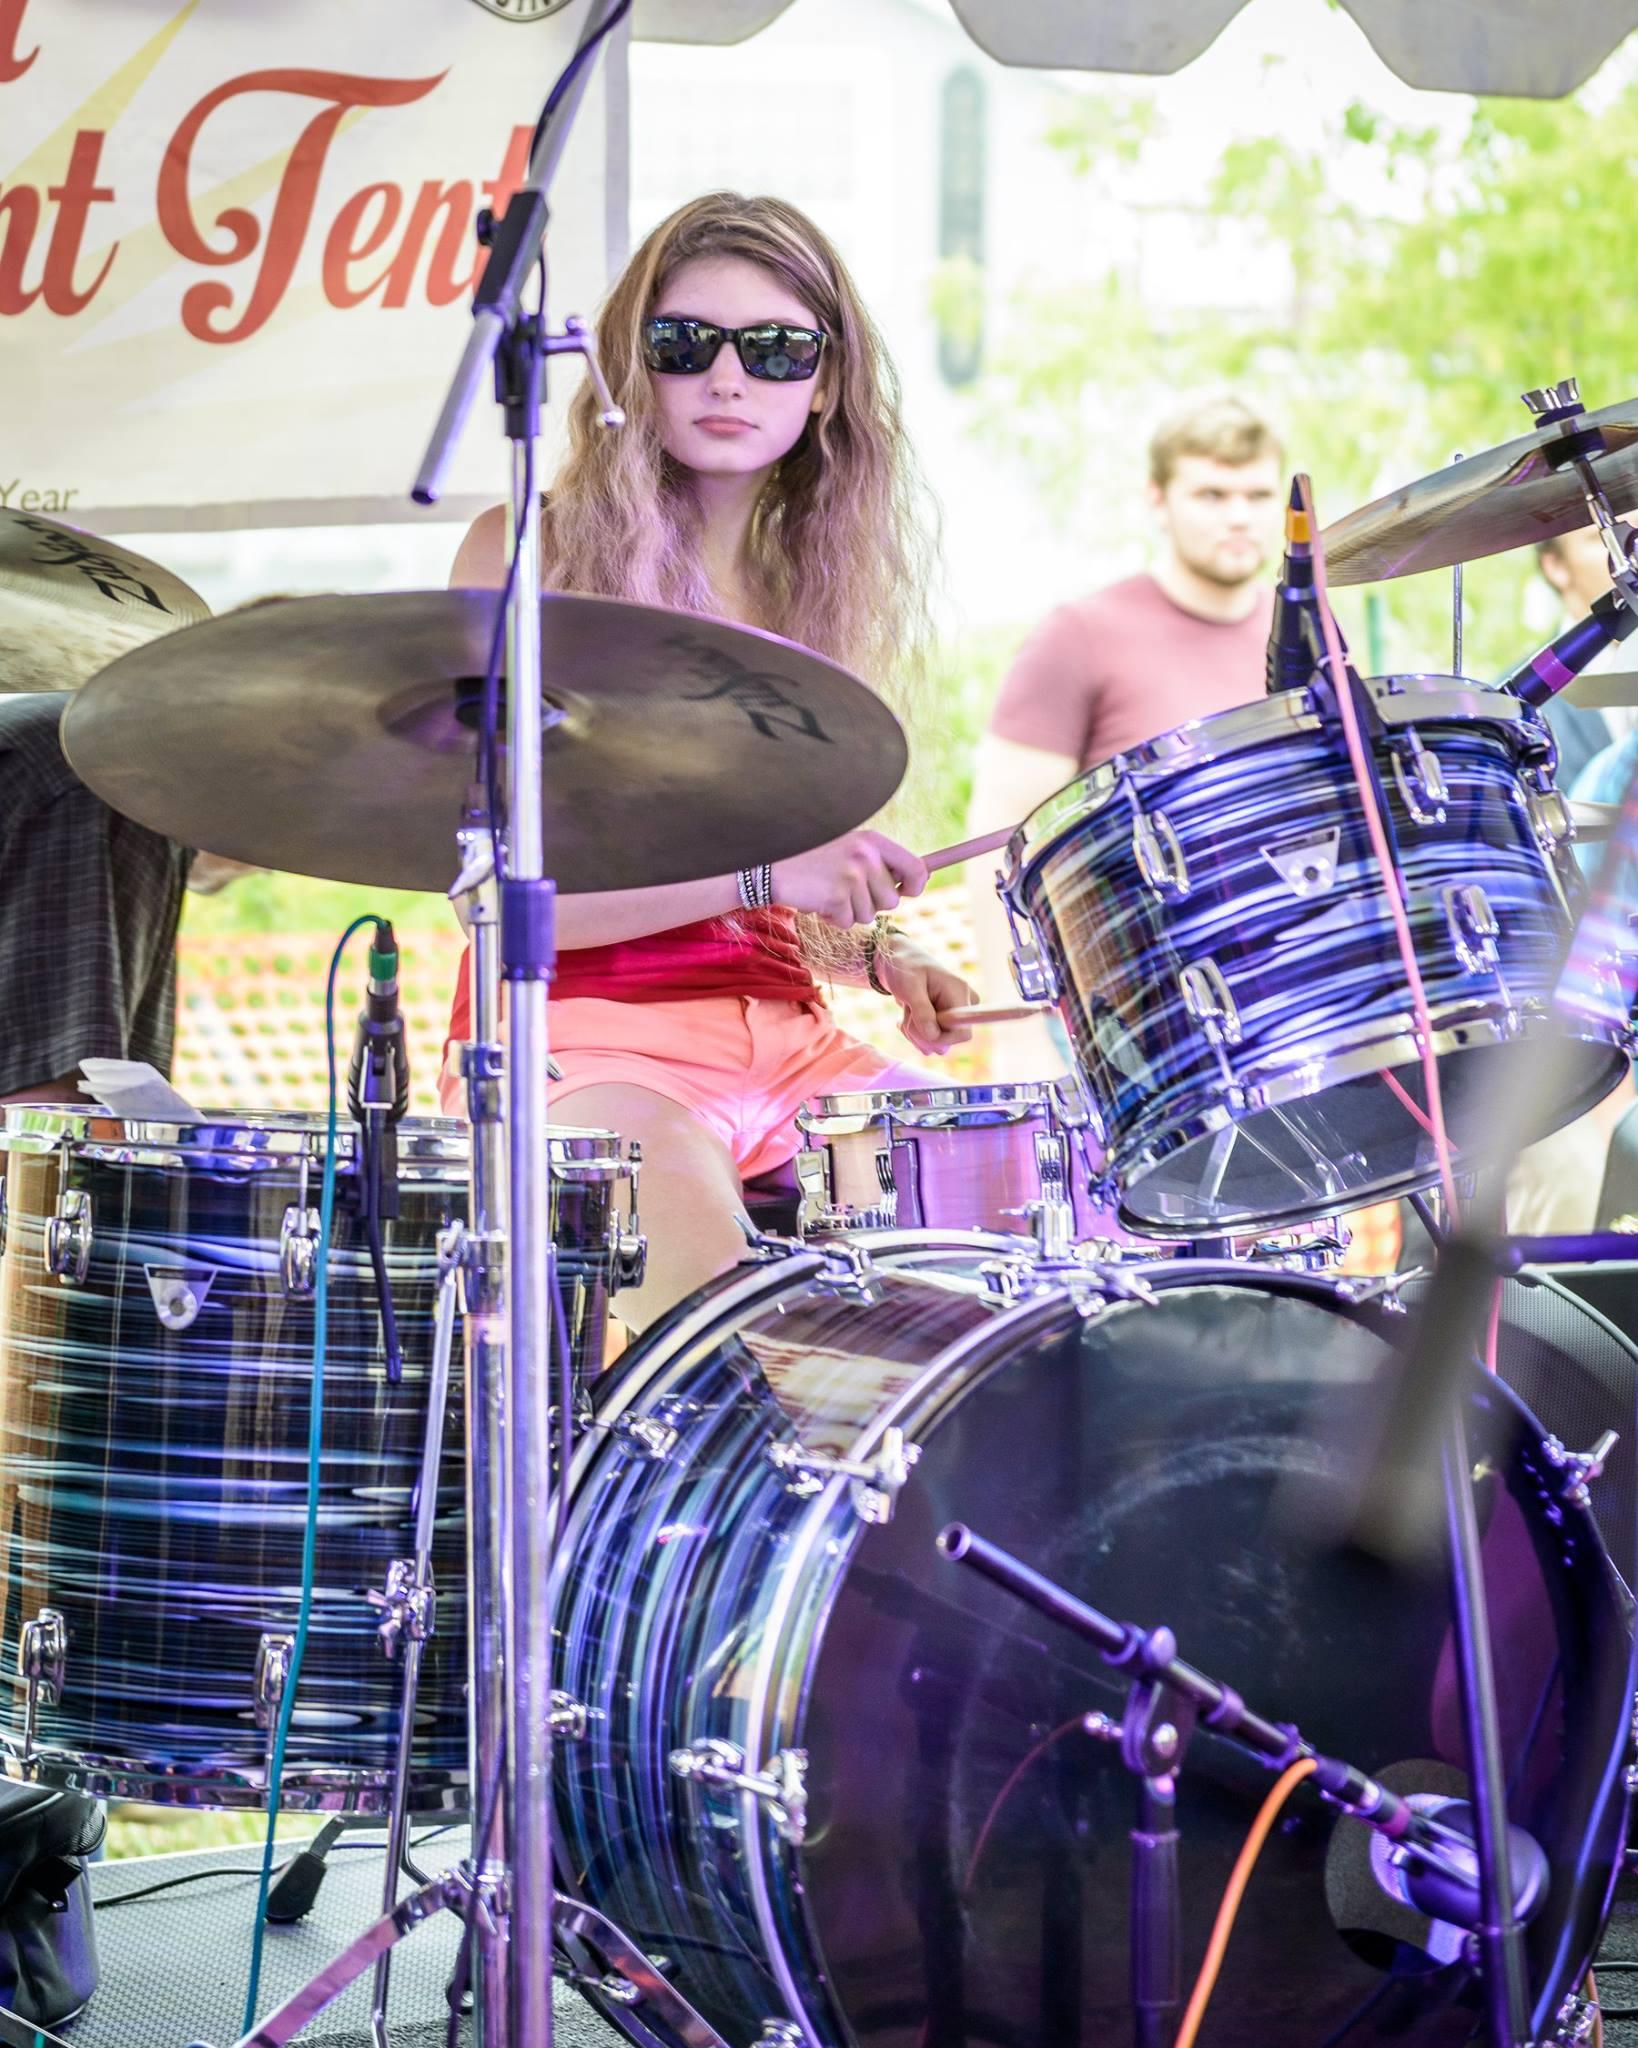 Vera at the 2017 Lobster Festival. Photo credit: Tim Sullivan